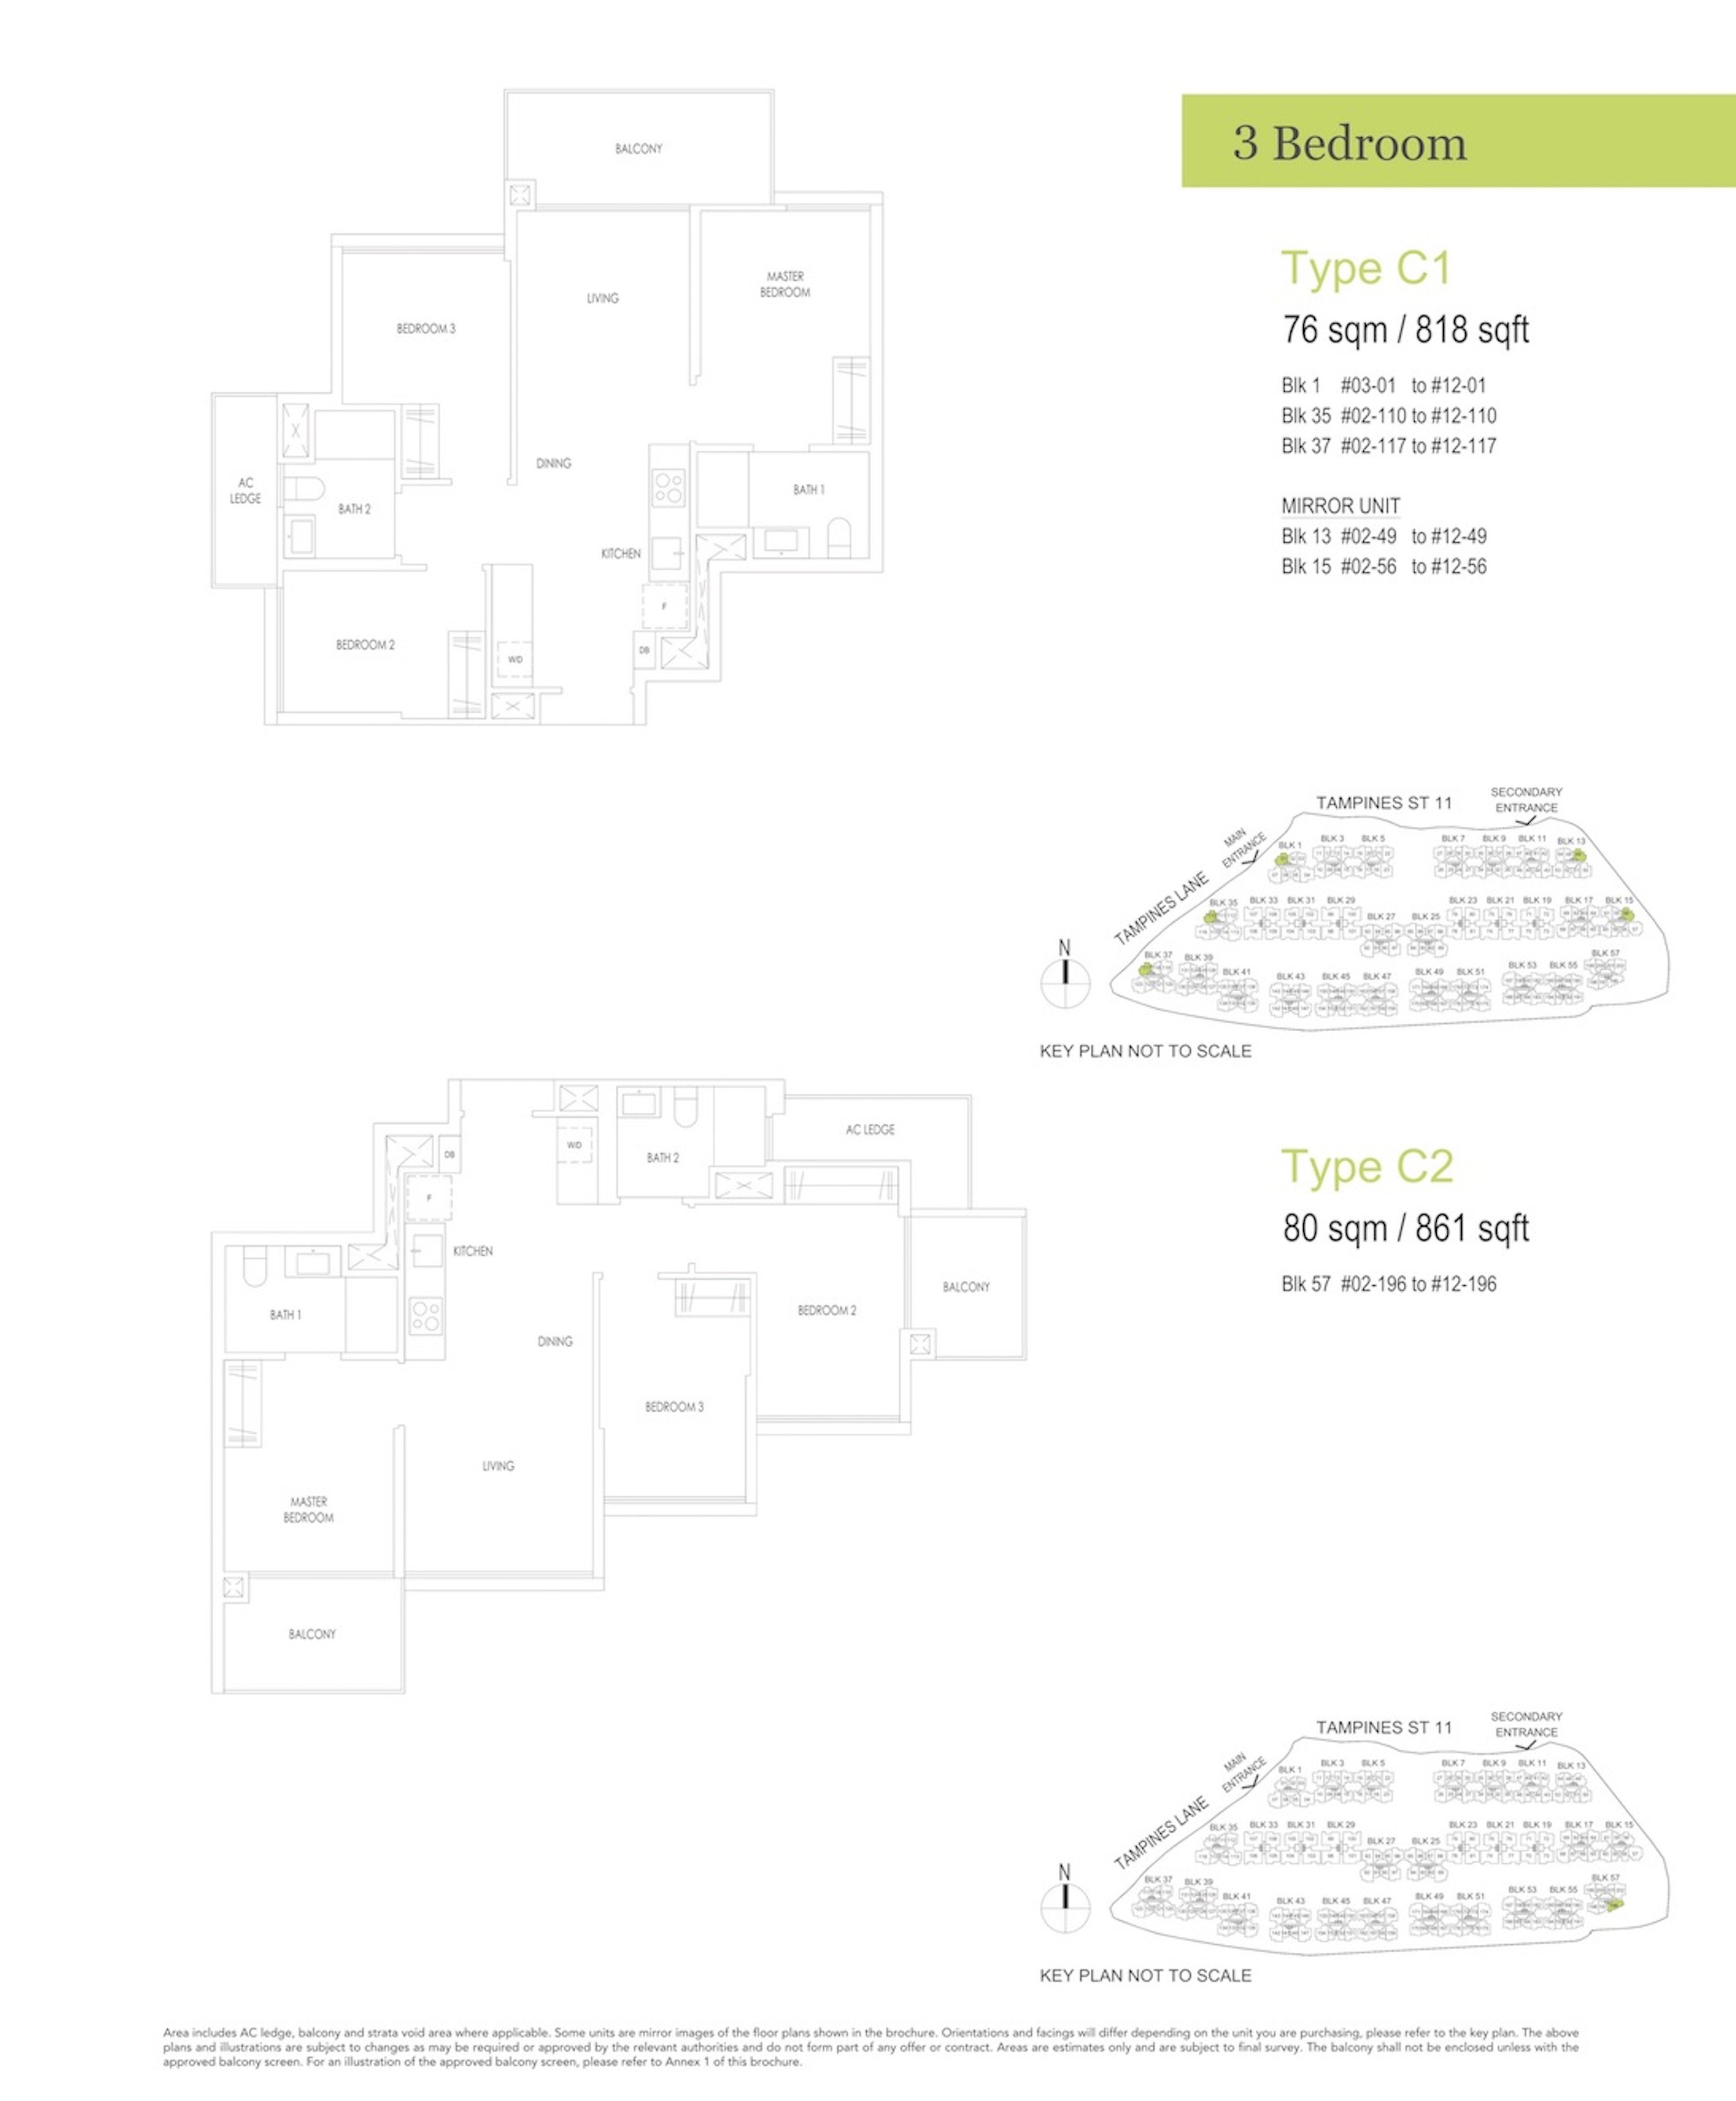 Treasure At Tampines 聚宝园 3-bedroom 3卧房 C1 C2